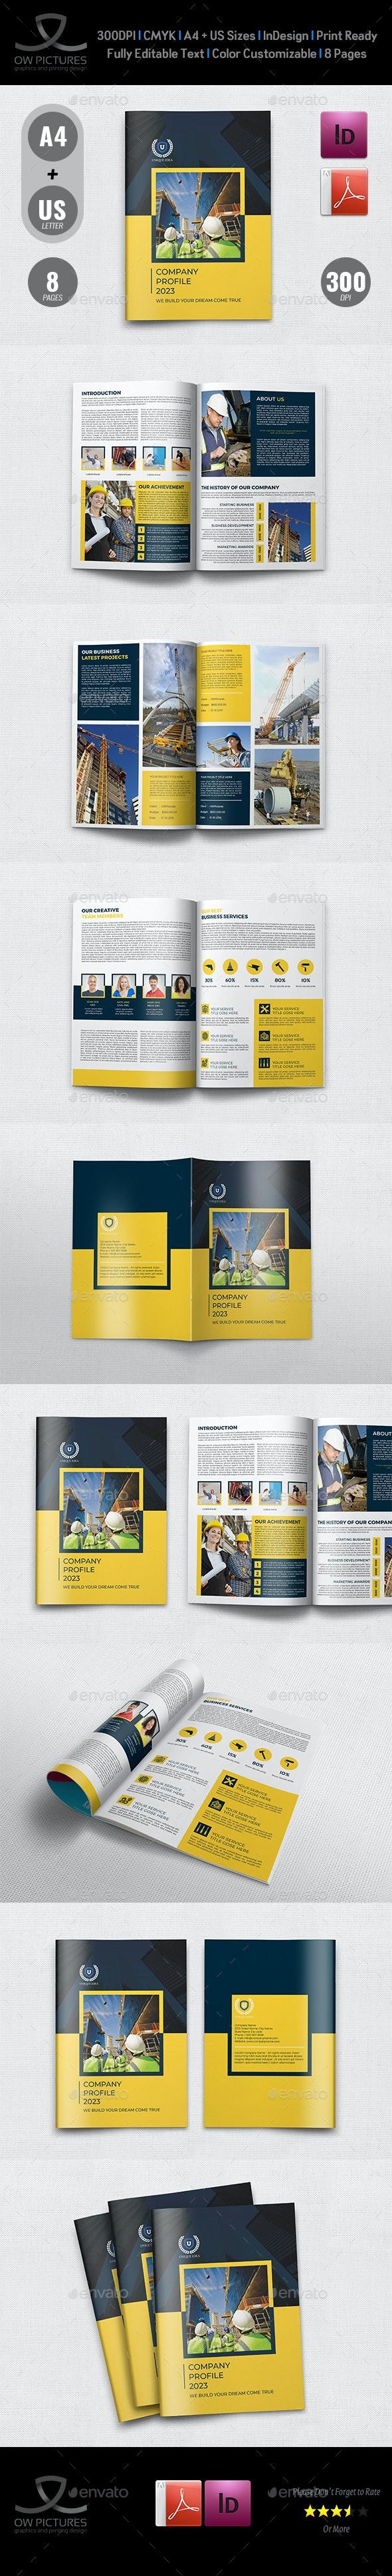 Construction Company Profile Brochure Template - Brochures Print Templates